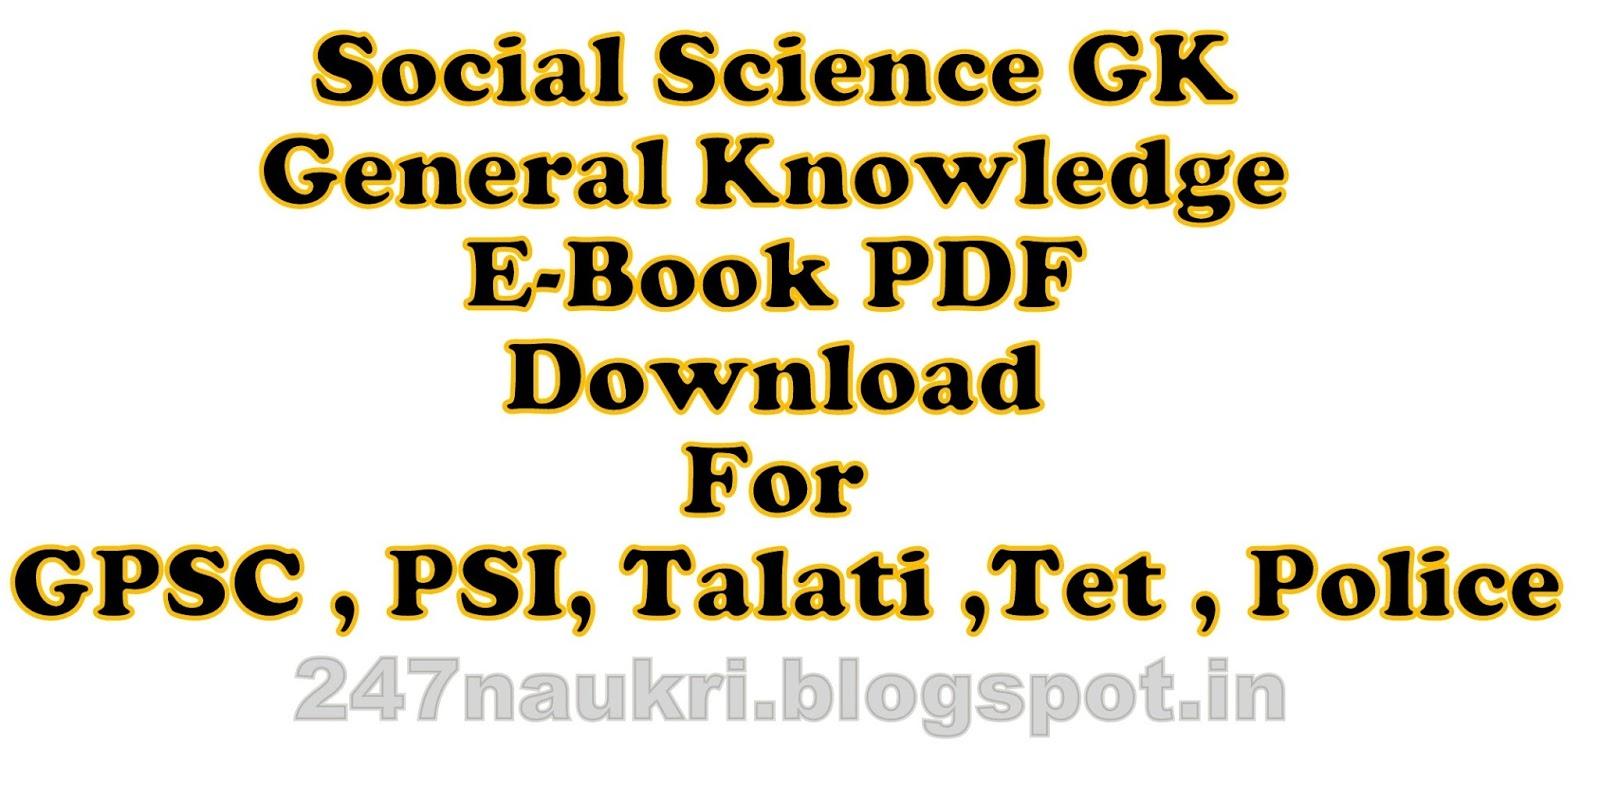 Eral Knowledge General Knowledge Pdf Books General Science